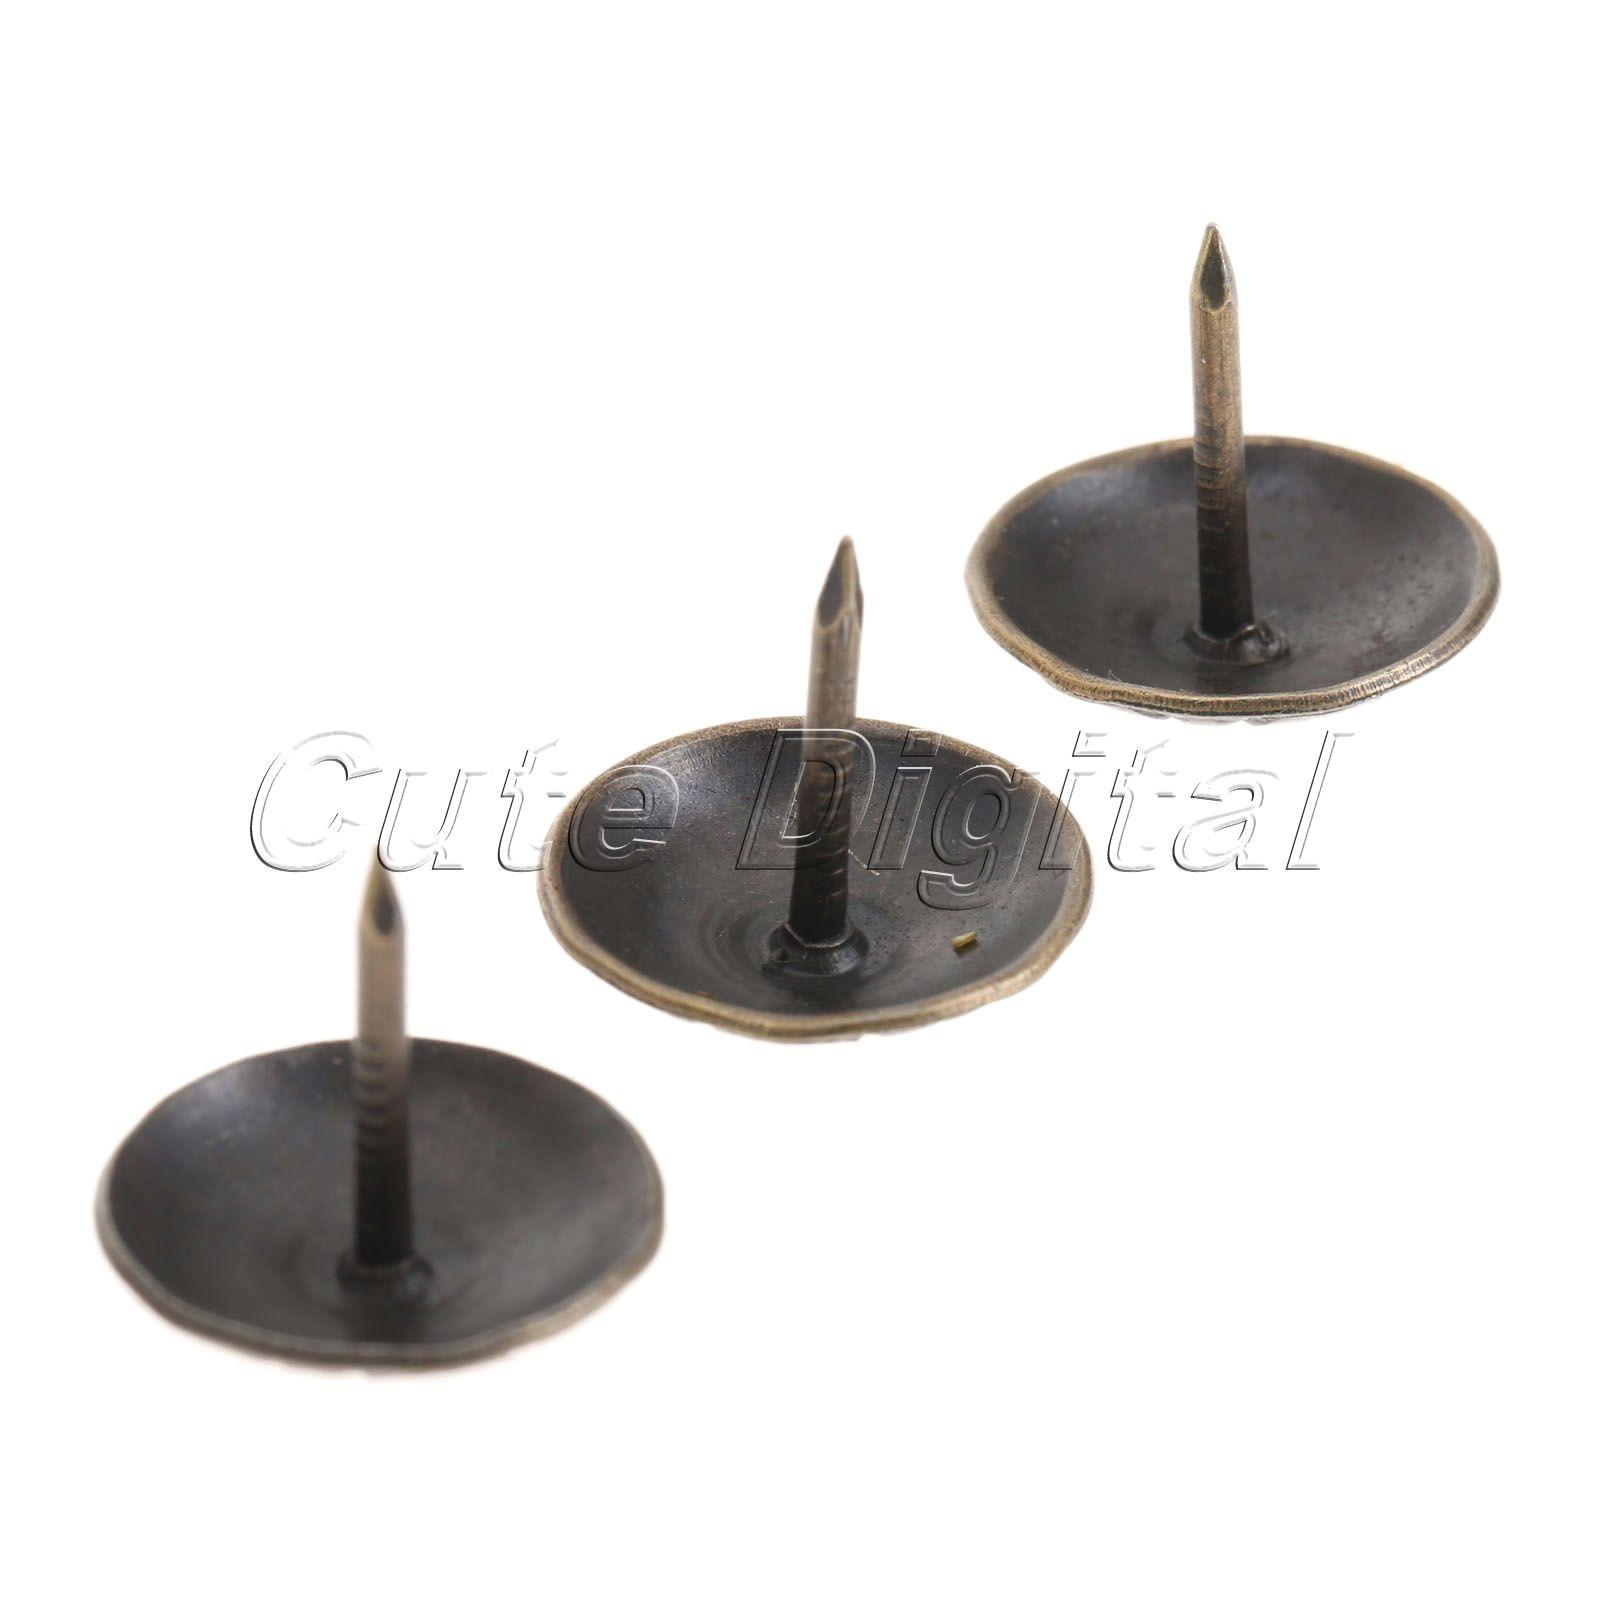 100pcs 16mm Antique Bronze Upholstery Nails Tacks Studs Vintage ...